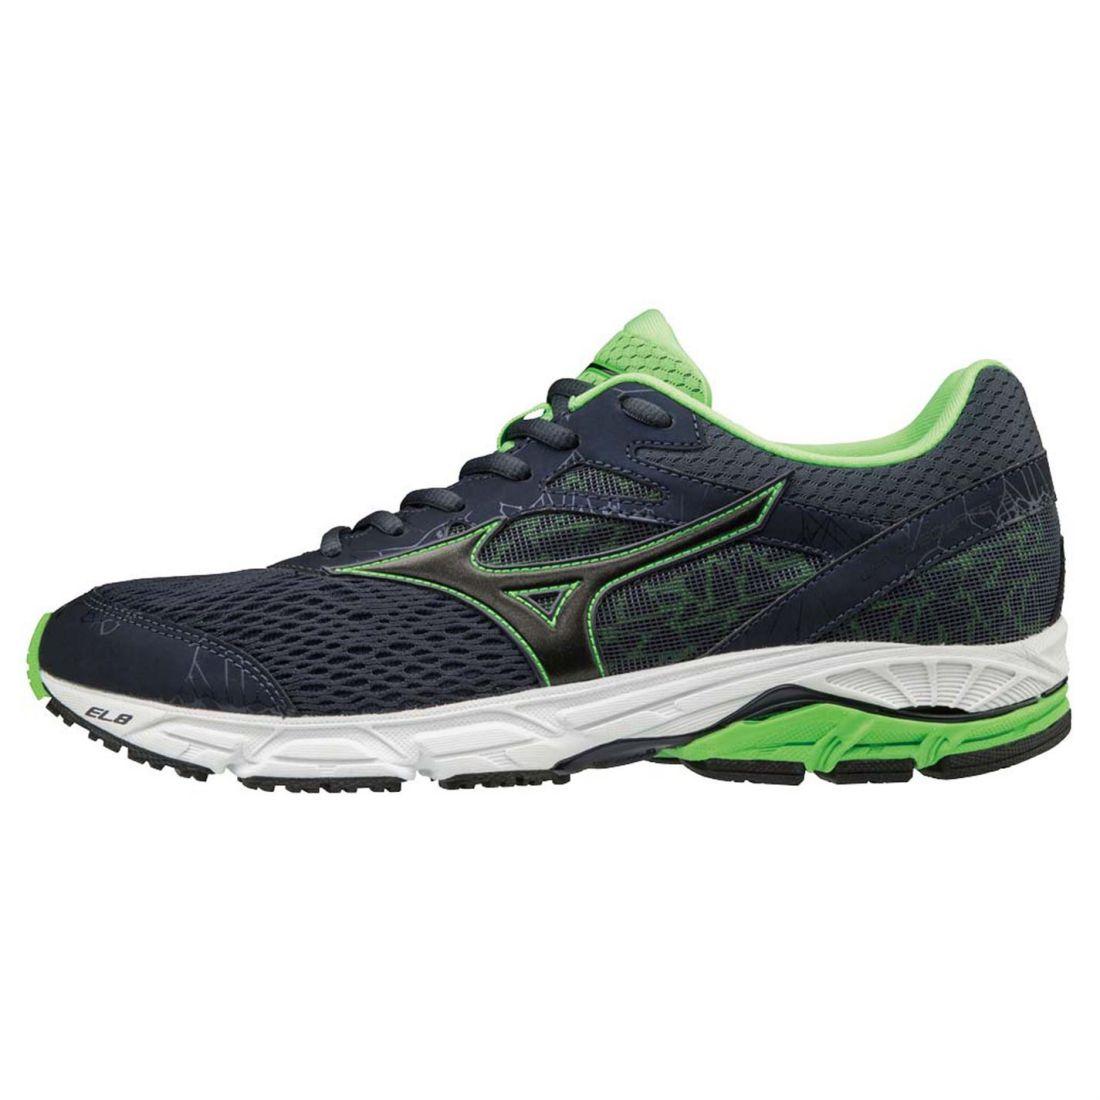 Mizuno Mens Wave Equate 2 Road Running Shoes | eBay